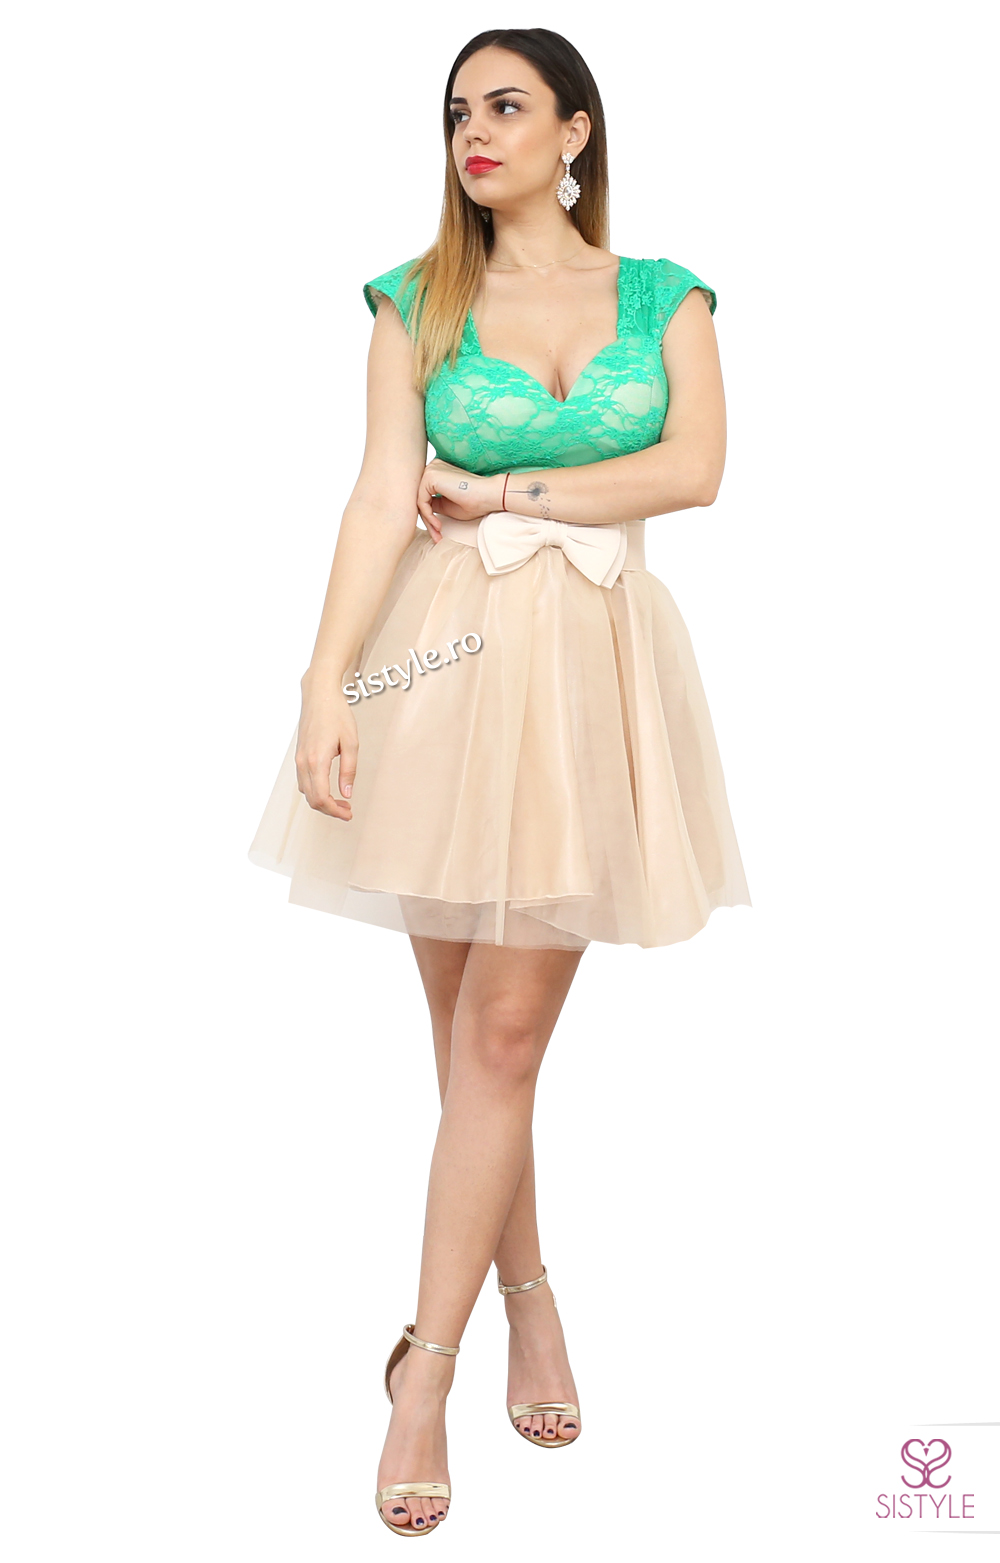 rochie banchet cu tull